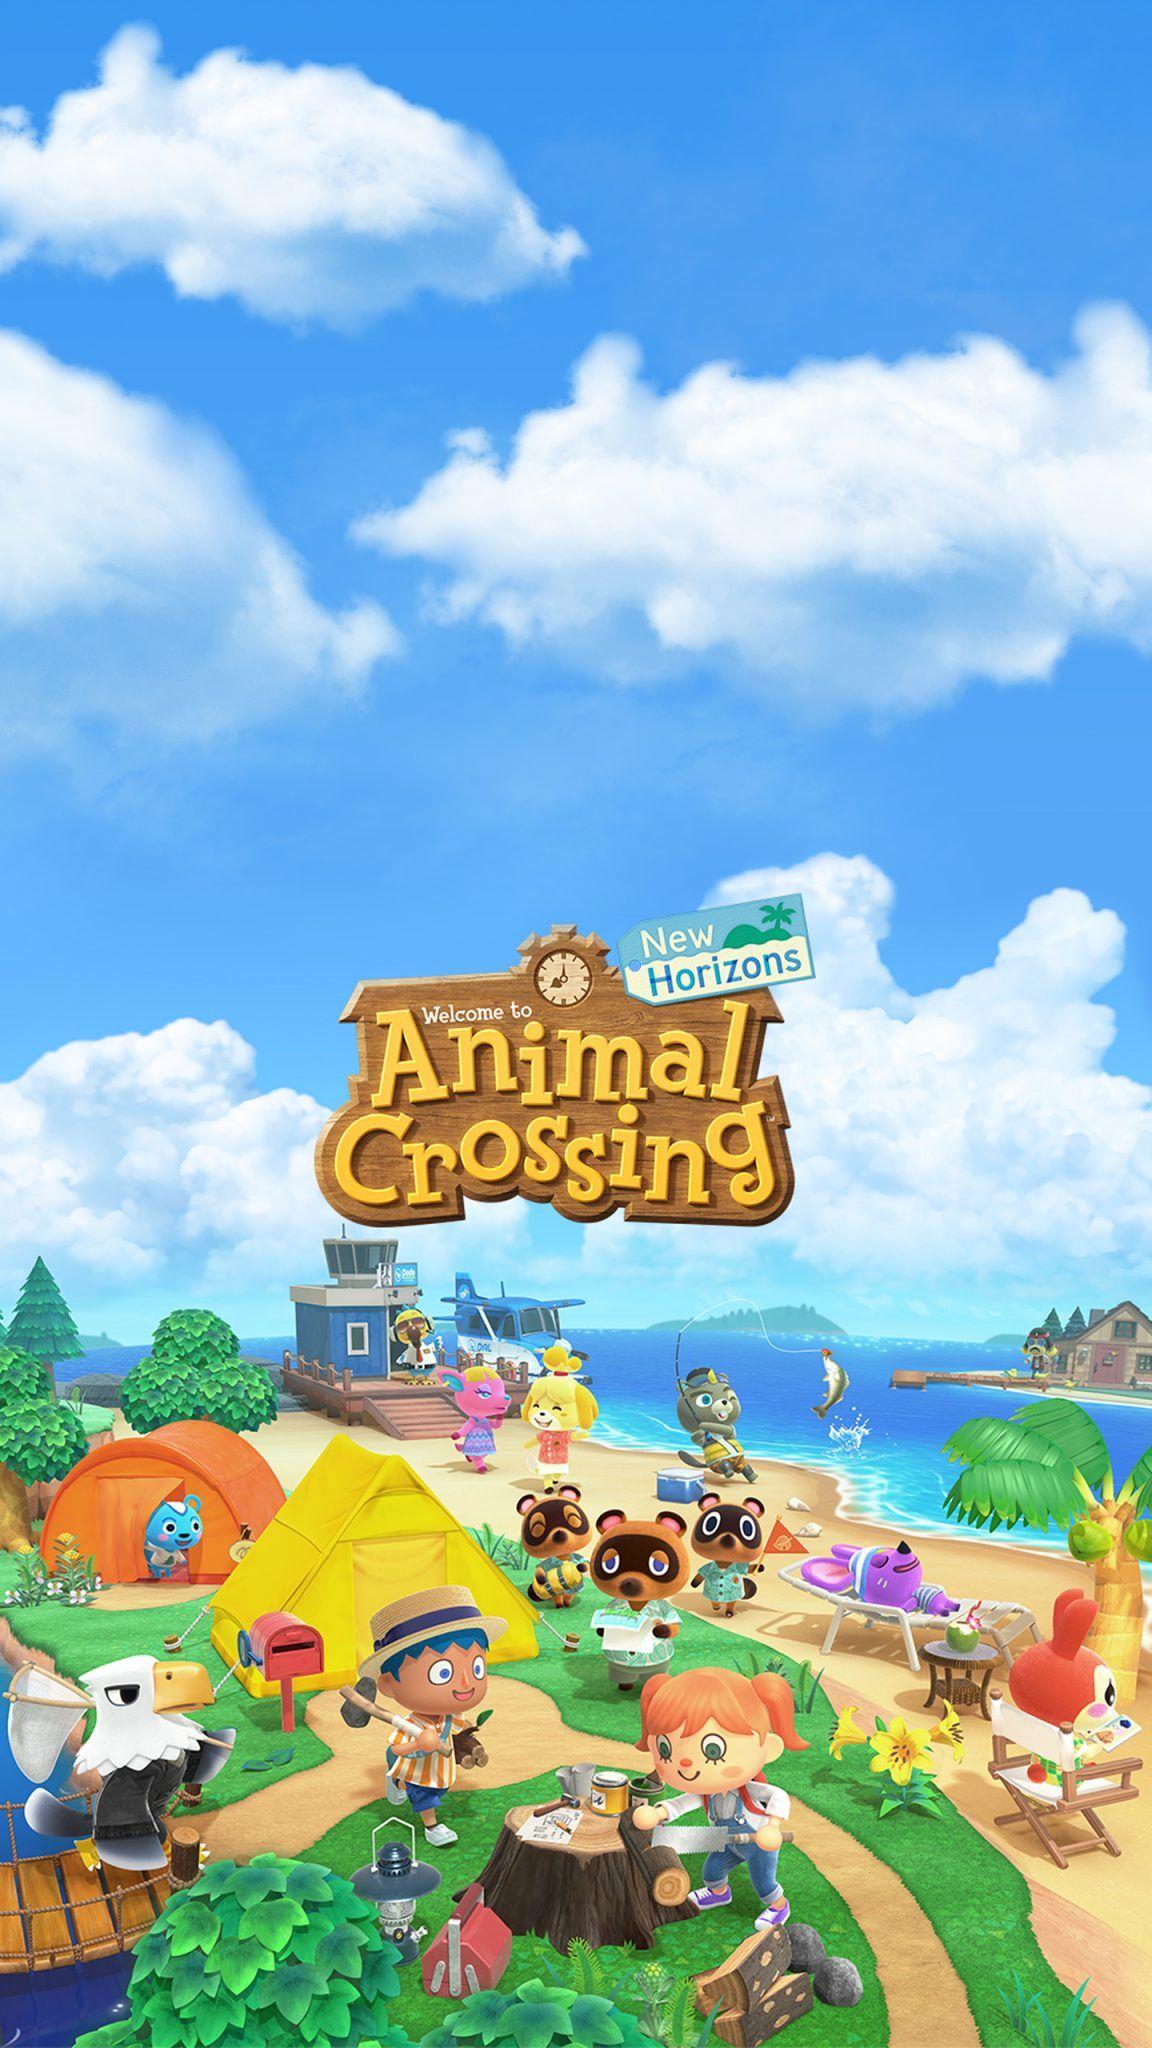 Best Nintendo Switch Games Bullet Journal Cover Ideas Animal Crossing December Bullet Journal